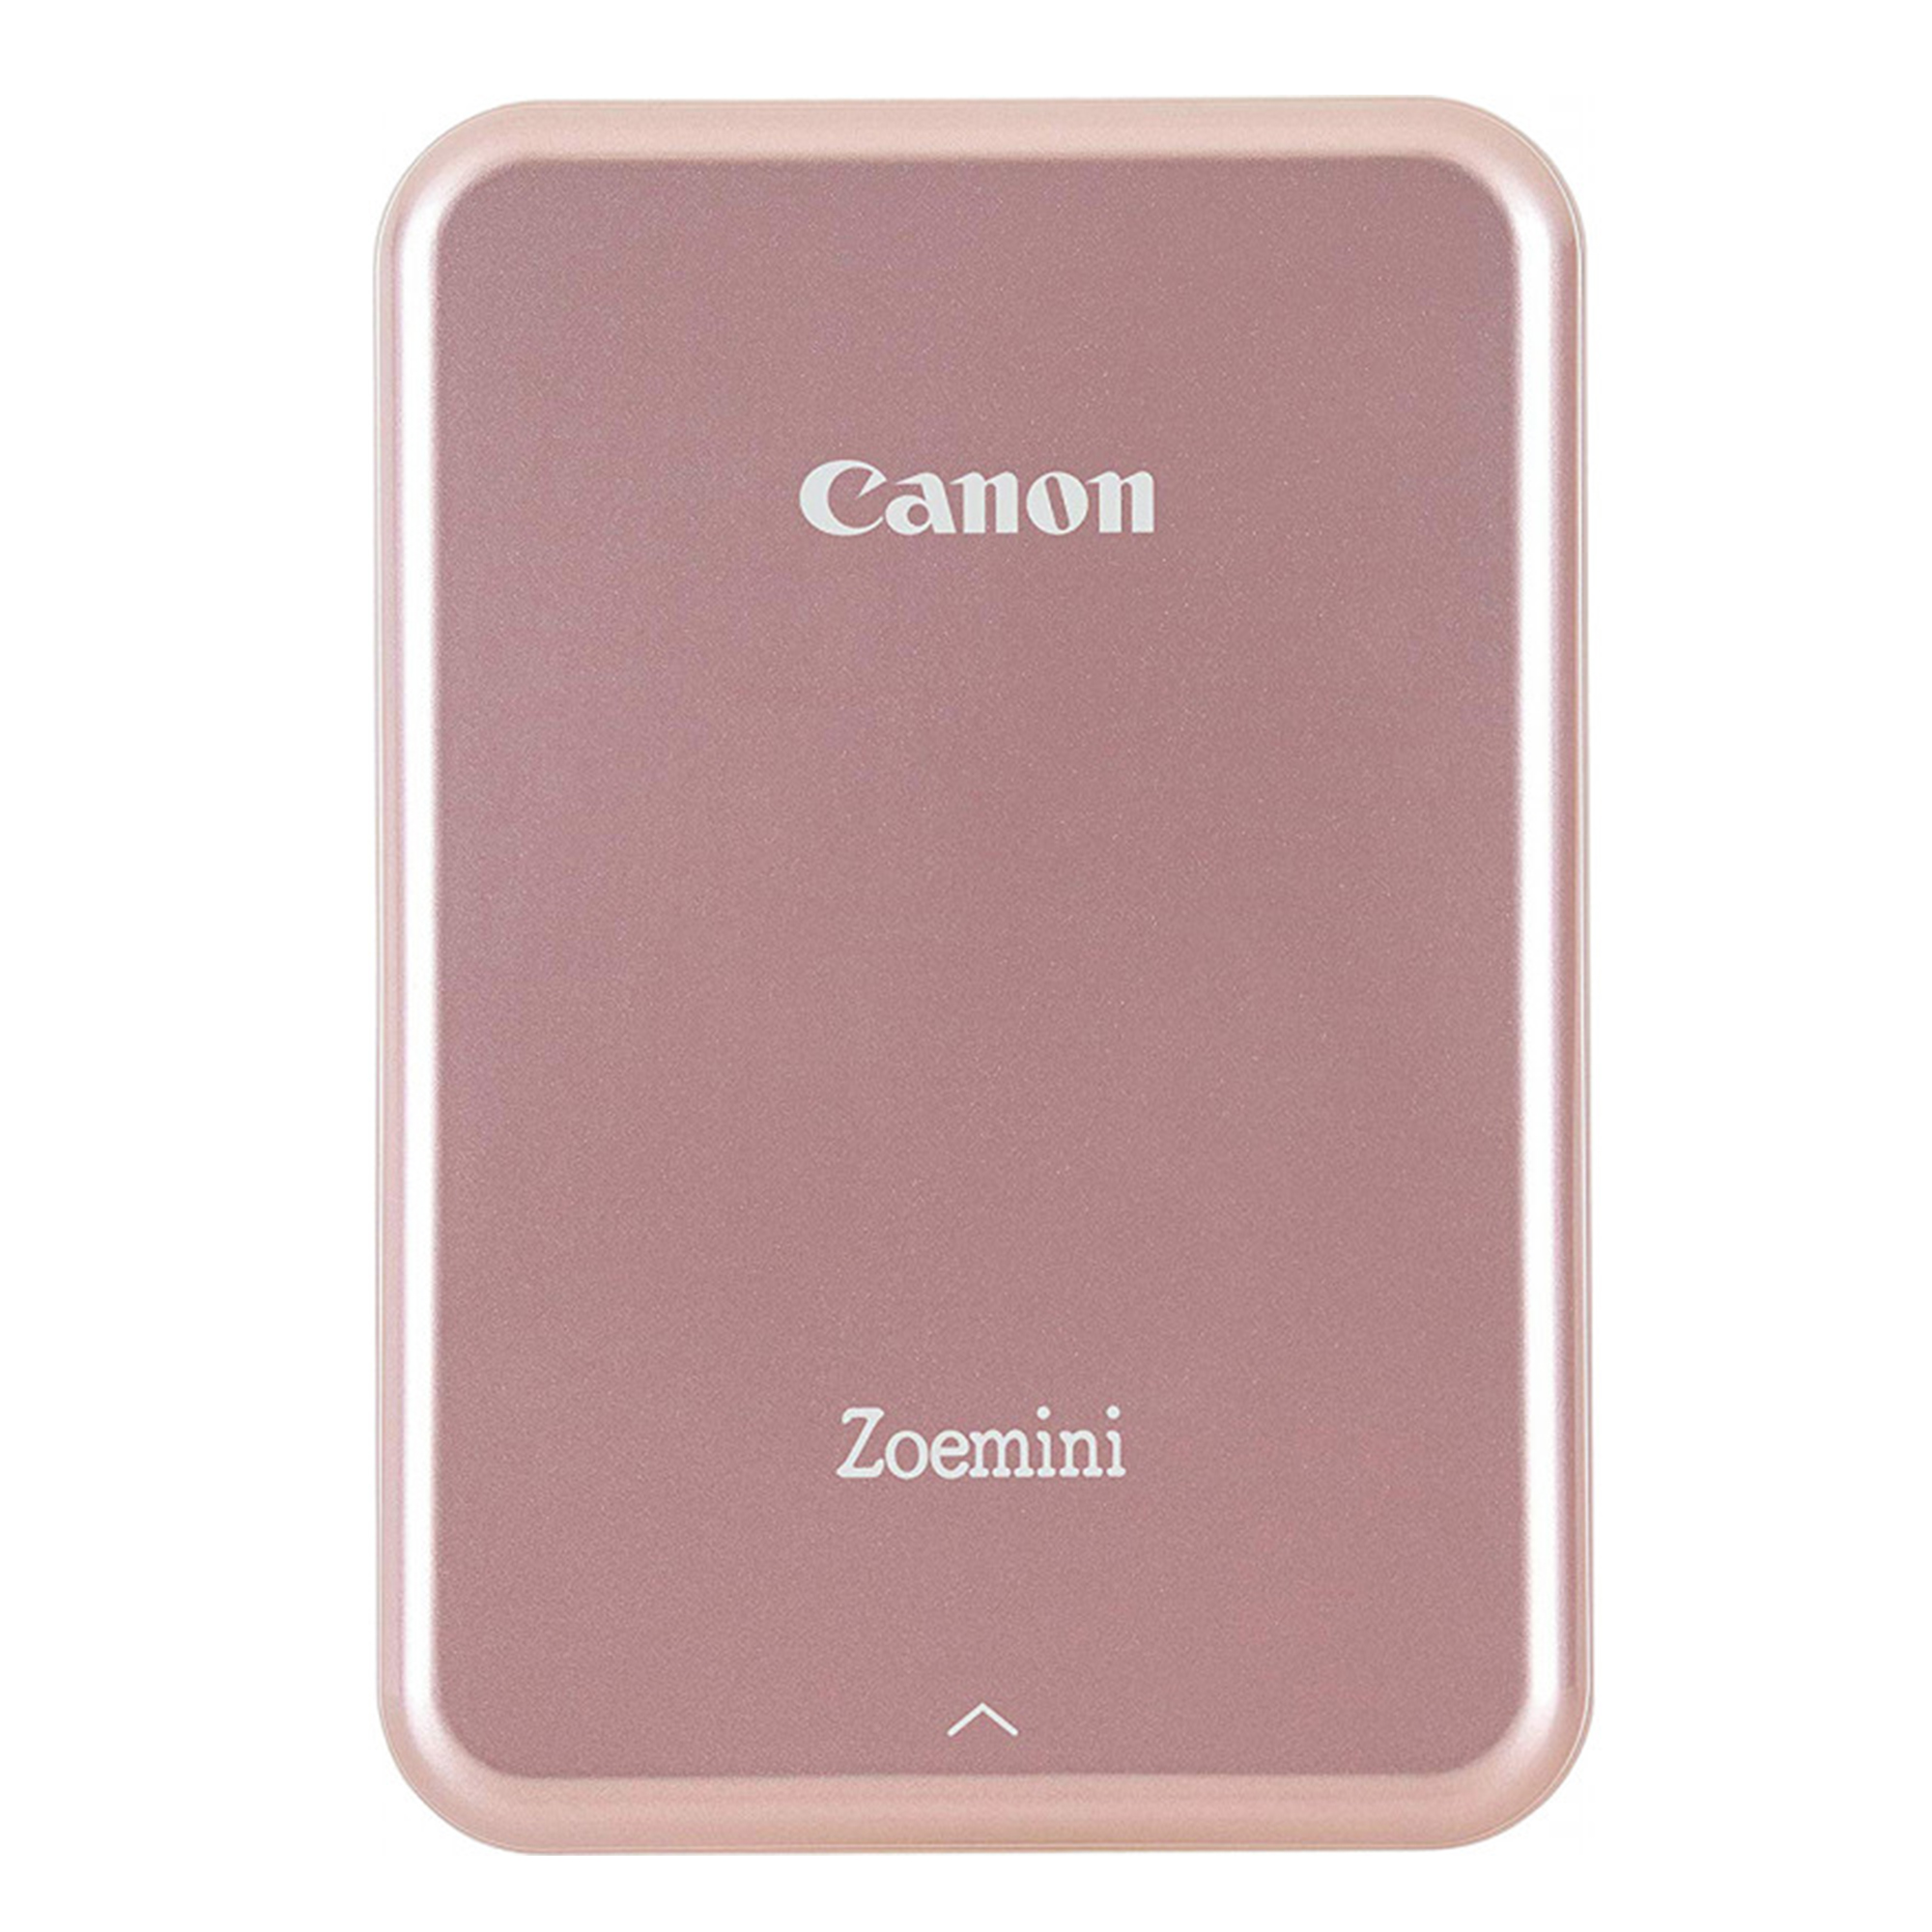 Canon Zoemini Printer - Pink + Canon Zink Paper ZP-2030 20 Sheets